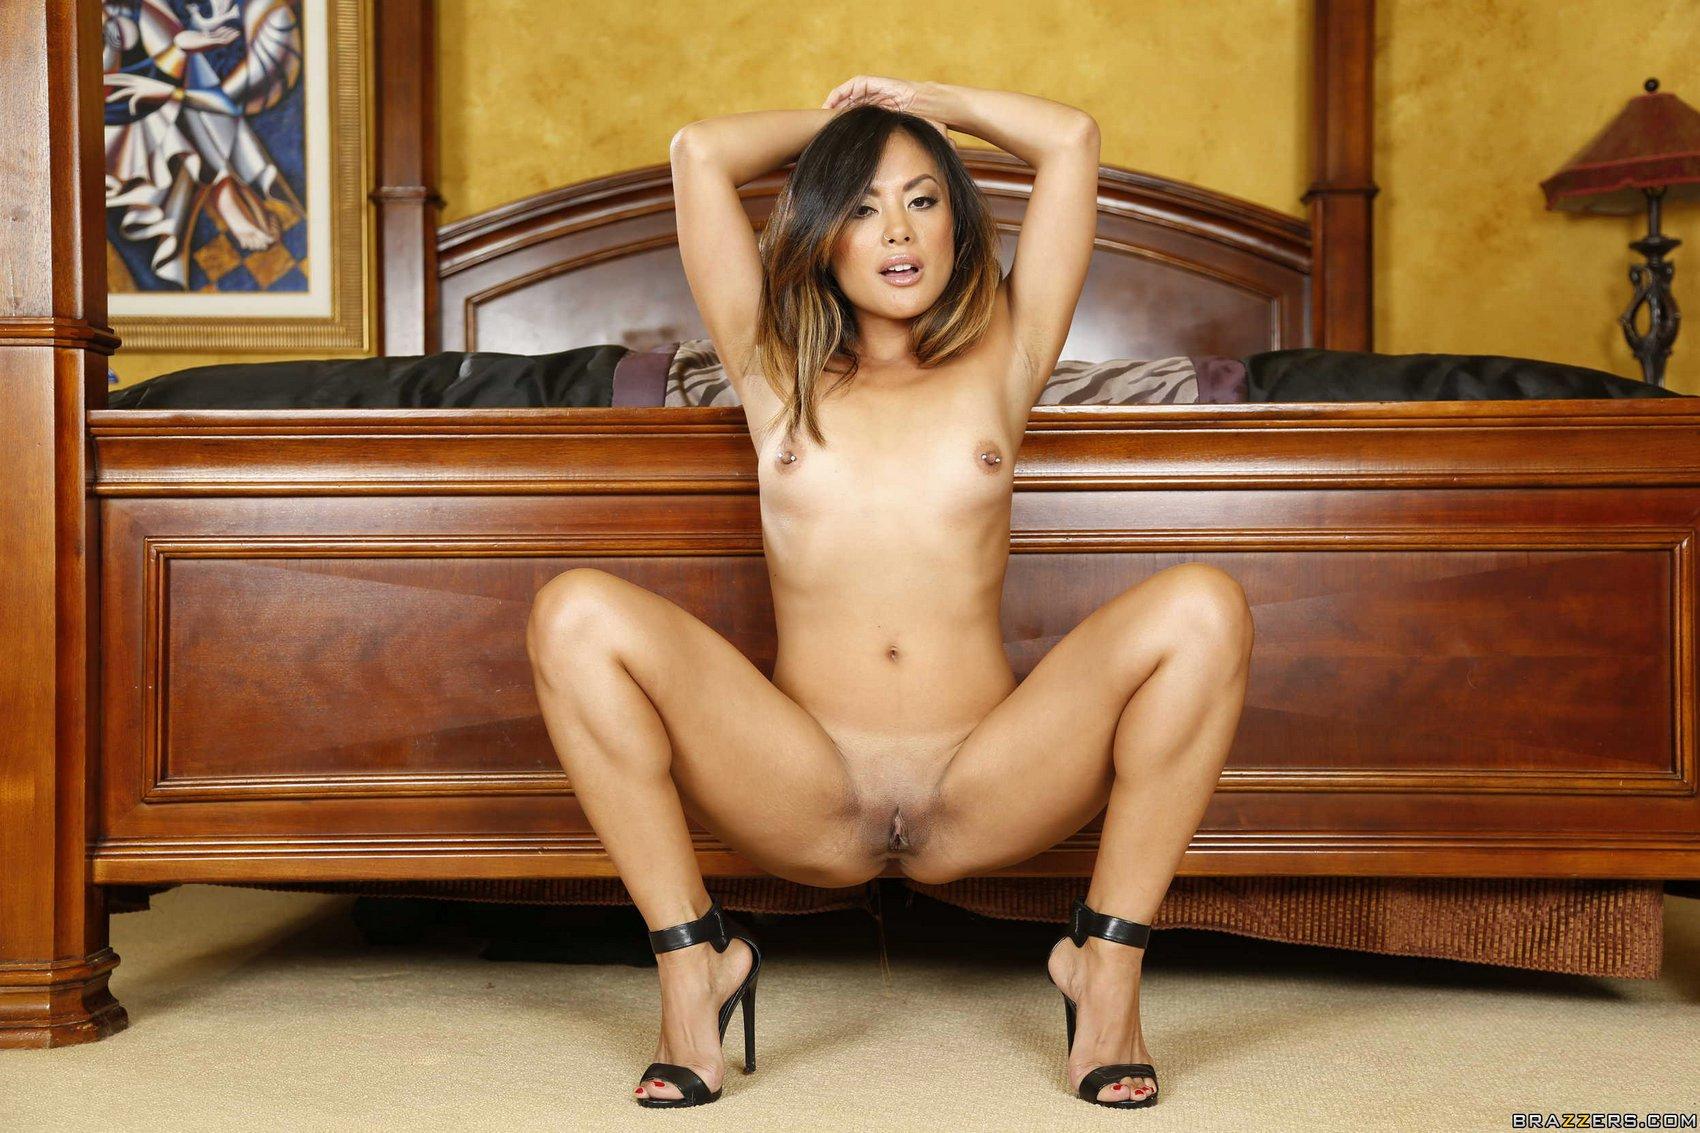 Kaylani lei nude pussy pic ex girlfriend photos